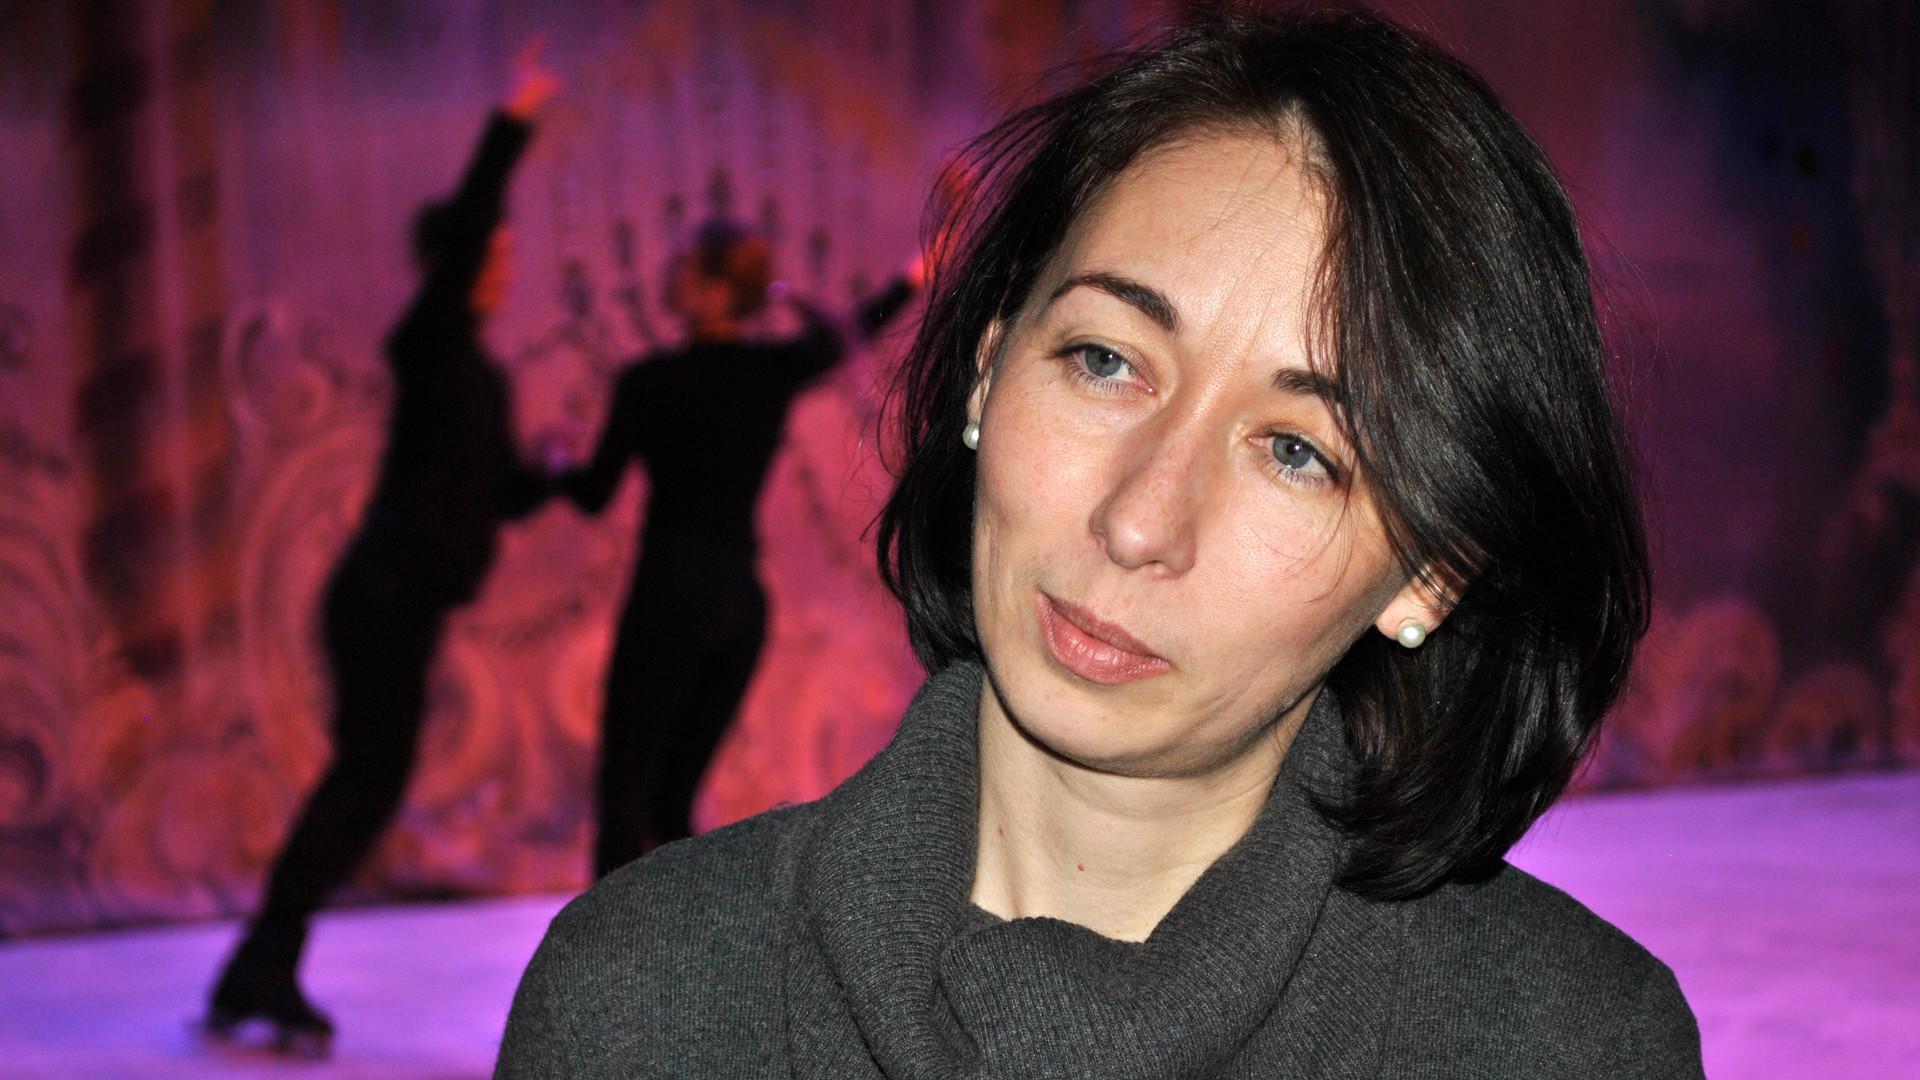 Јекатерина Фјодорова